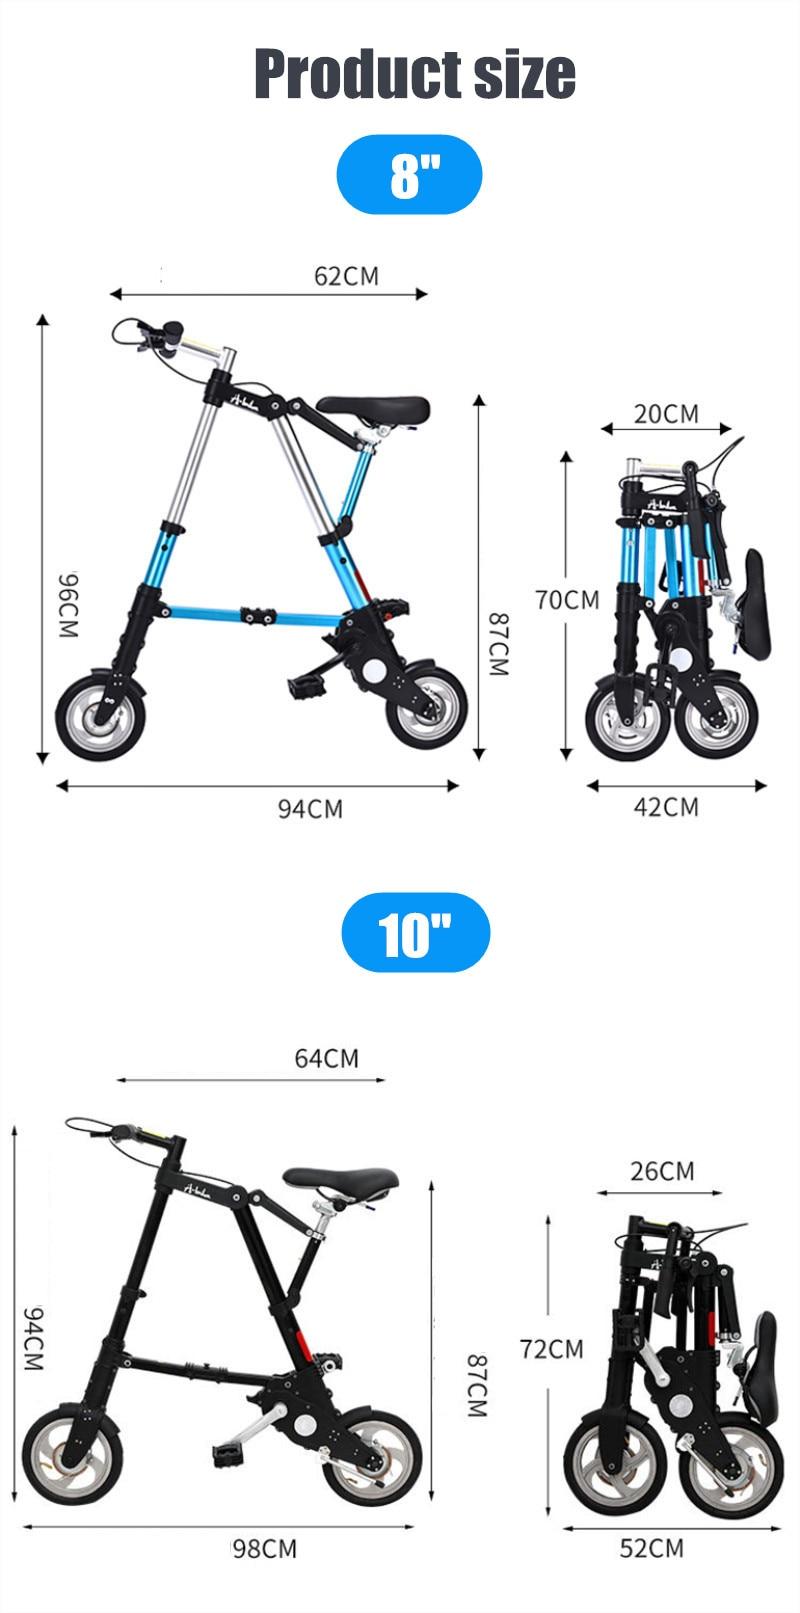 "HTB15VydXhv1gK0jSZFFq6z0sXXaP Brand New Ultra Light  8""/10"" Mini Folding Bike Bicycle Portable Outdoor Subway Transit Vehicles Foldable Bicicleta"